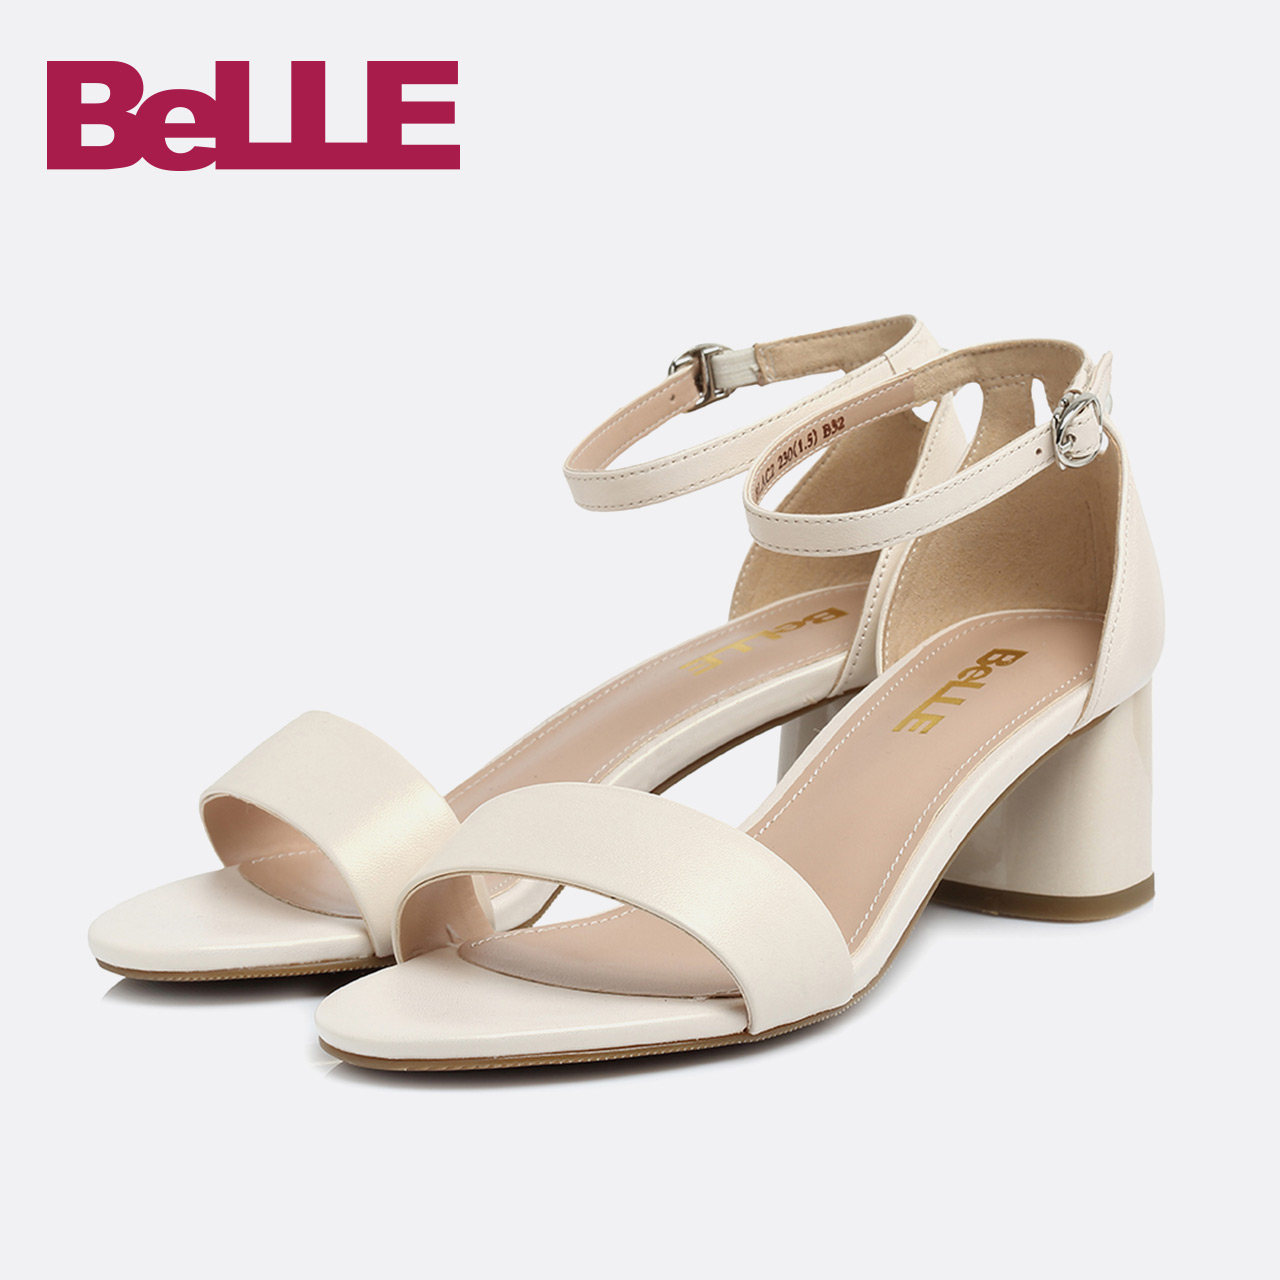 Belle-百丽凉鞋18夏新商场同款羊皮女一字带粗跟女鞋BLAC2BL8